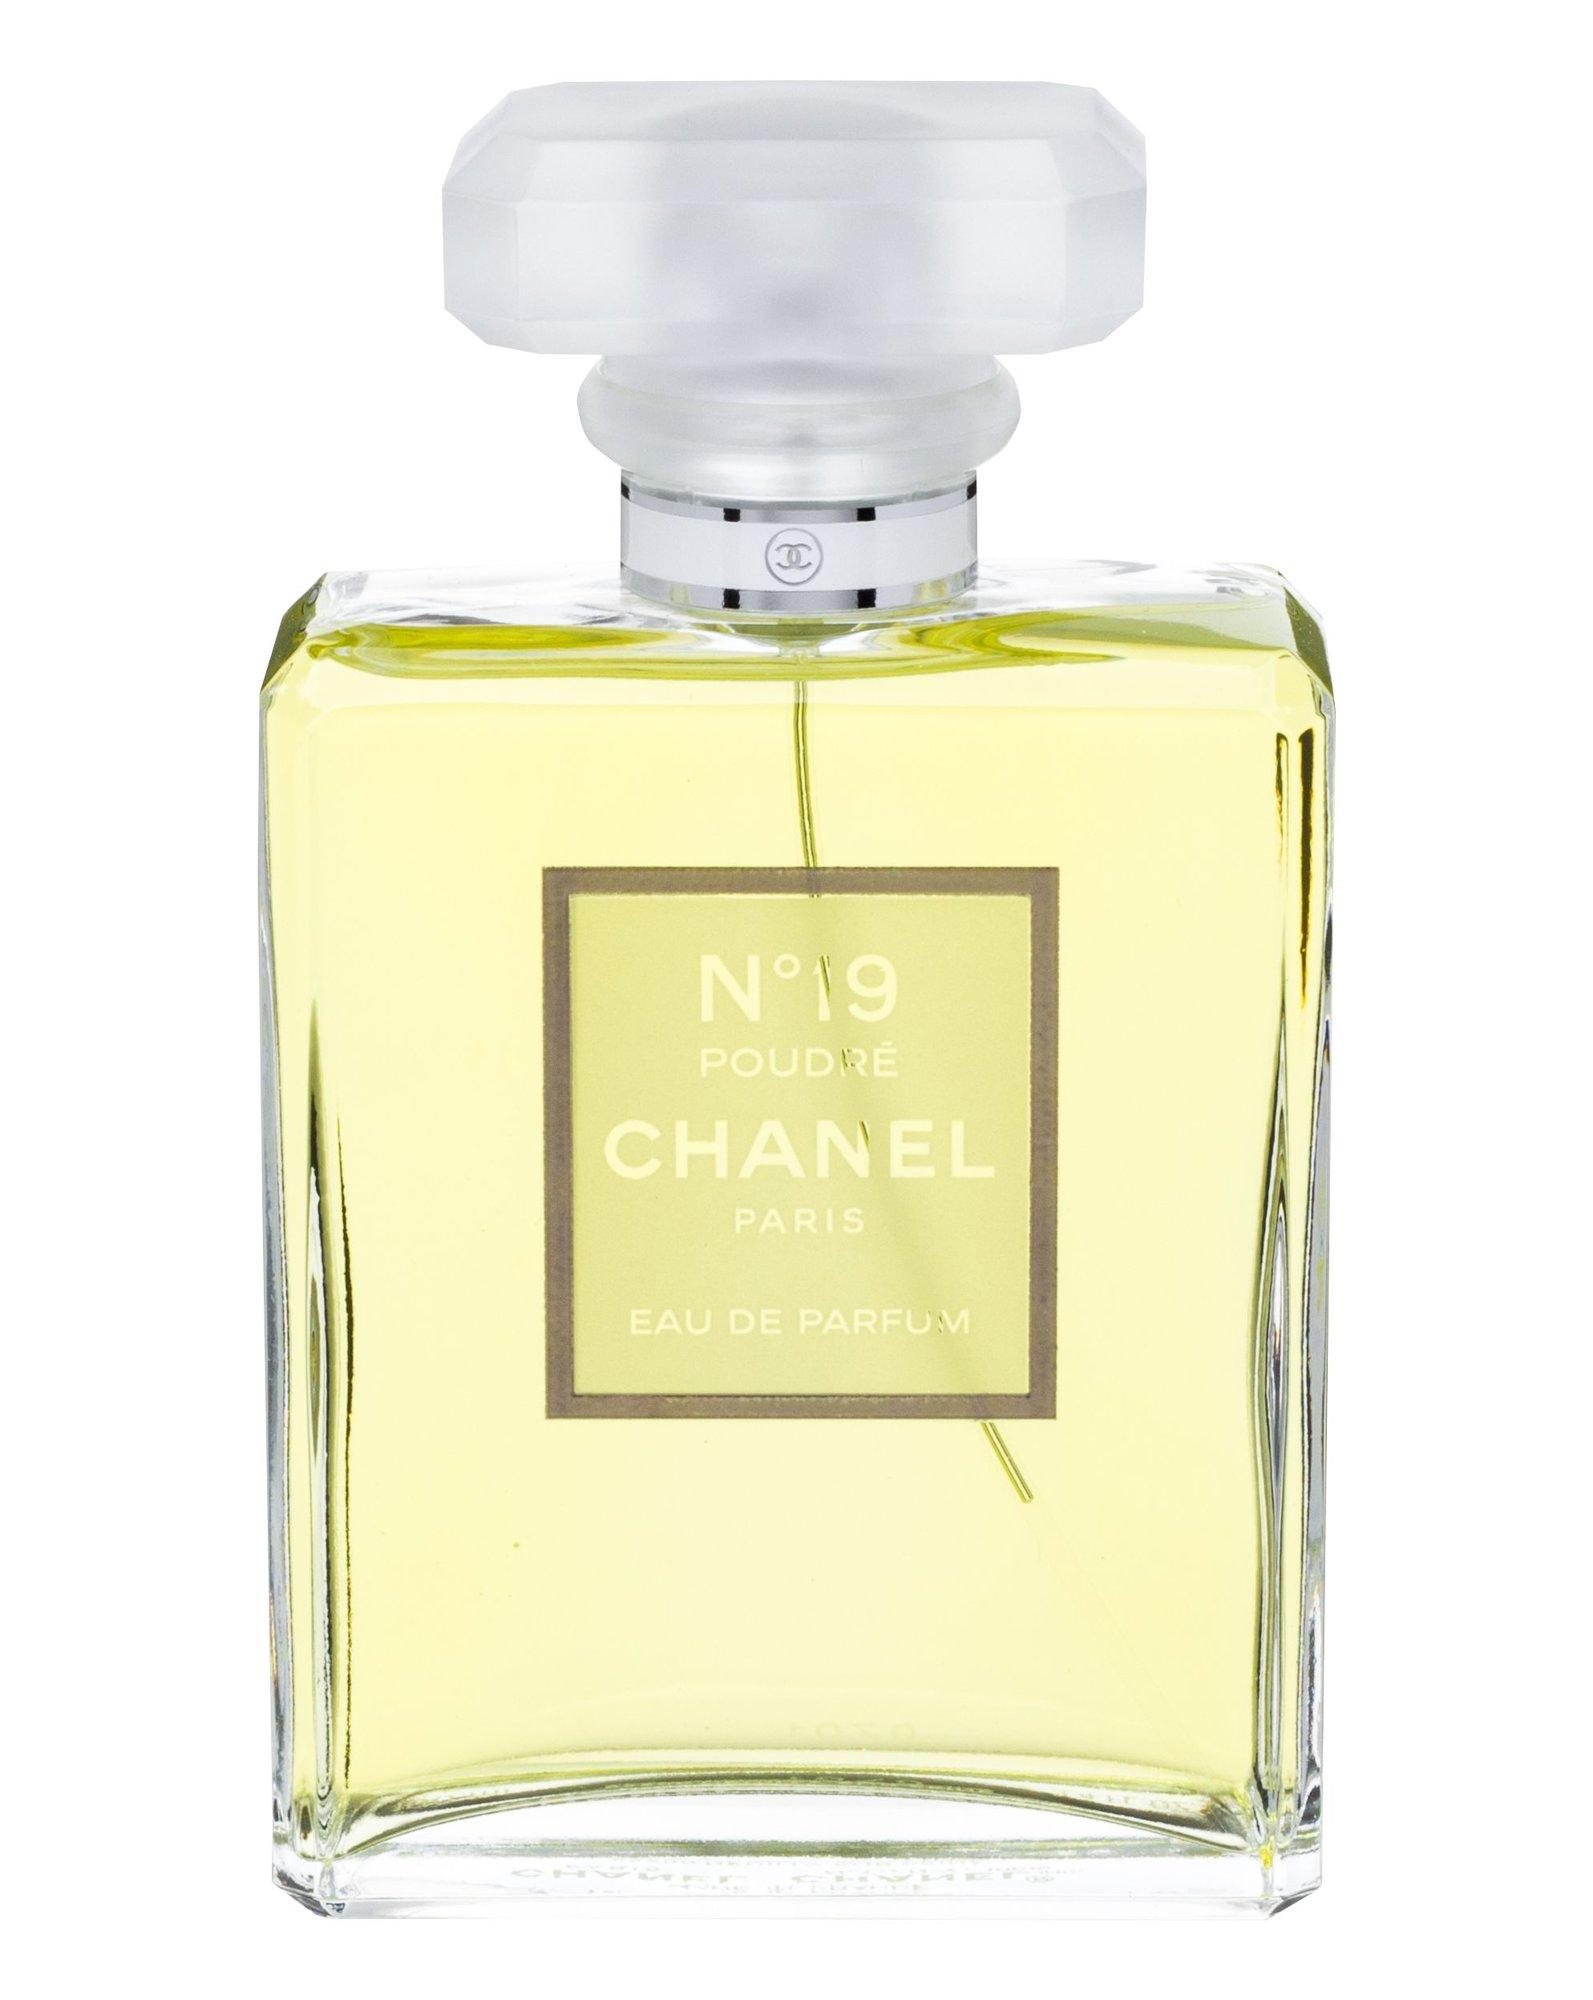 Chanel No. 19 Poudre EDP 100ml